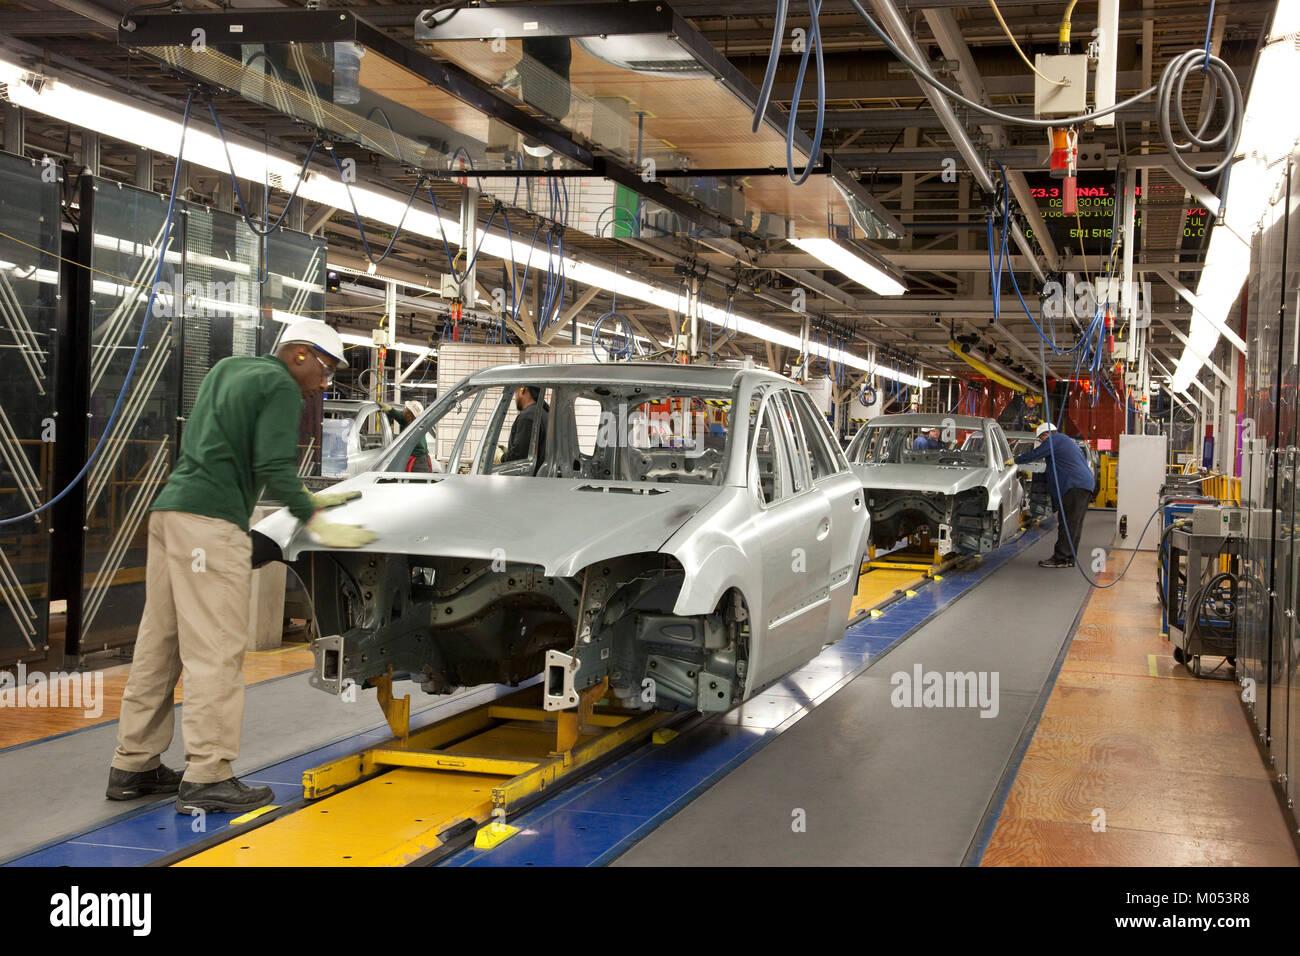 Mercedes benz manufacturing plant stock photos mercedes for Mercedes benz manufacturing